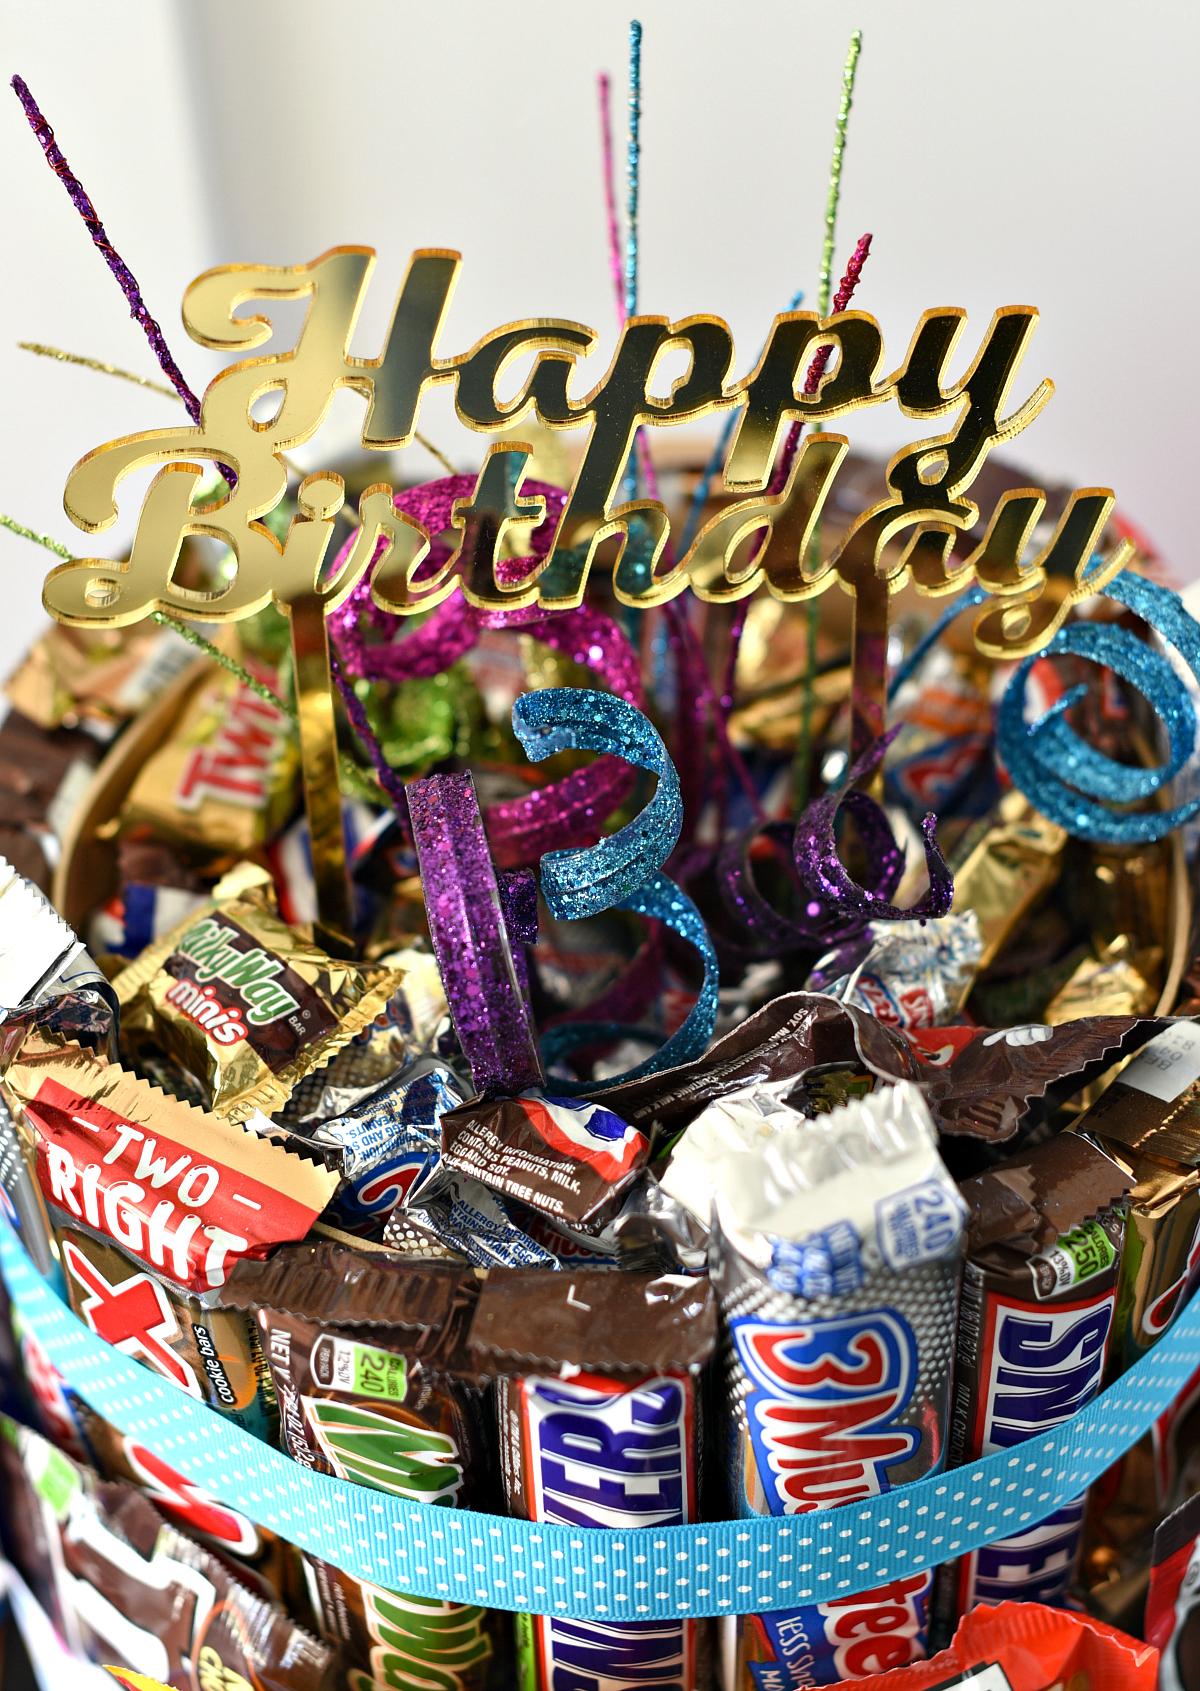 Chocolate birthday gift idea